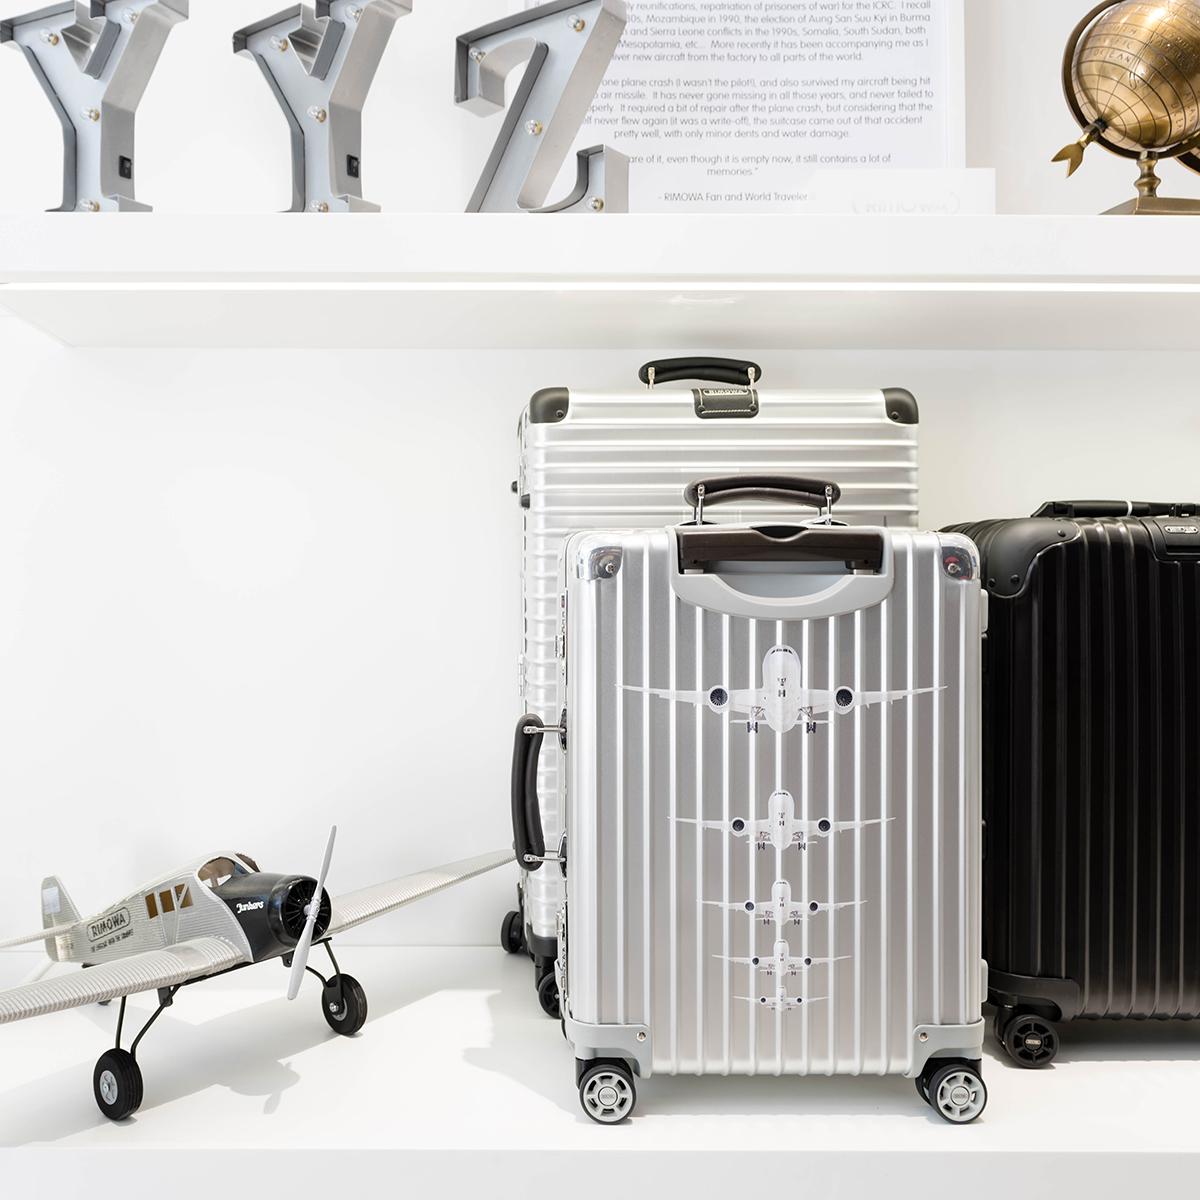 RIMOWA X LAIRD KAY avgeek luggage.jpg